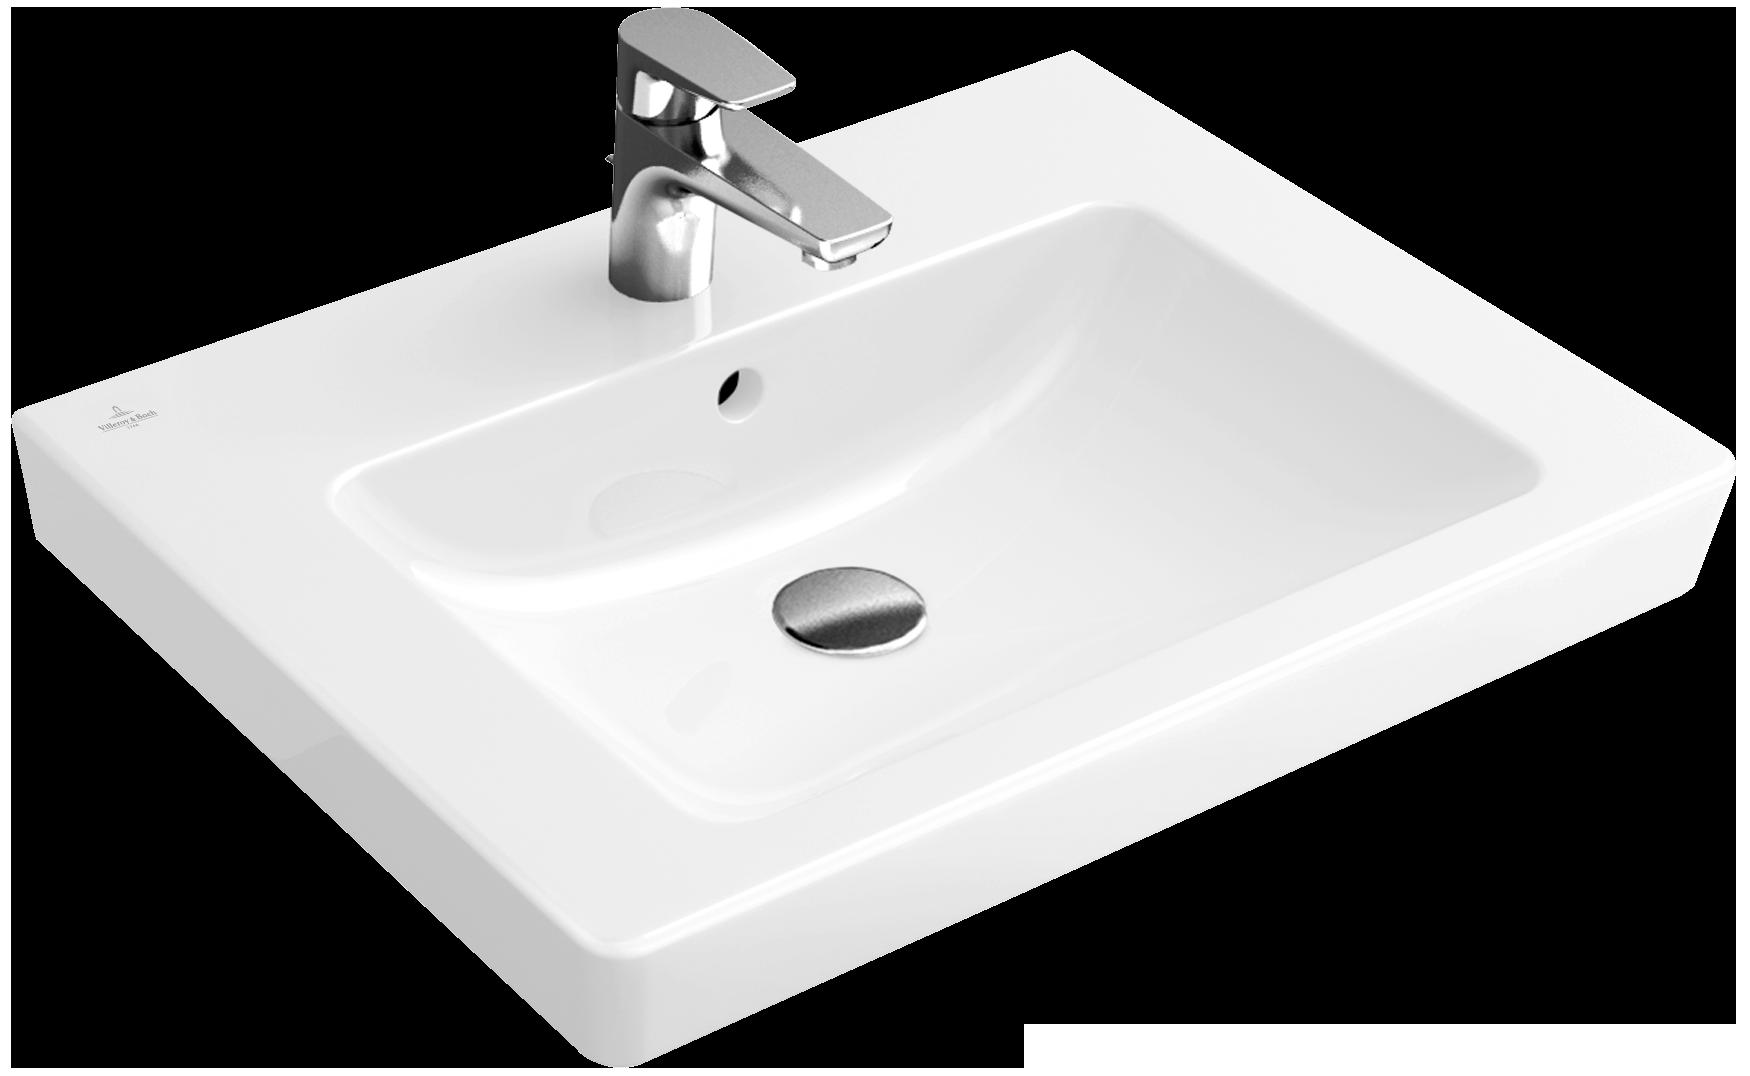 subway 2 0 washbasin angular 71136g villeroy boch. Black Bedroom Furniture Sets. Home Design Ideas